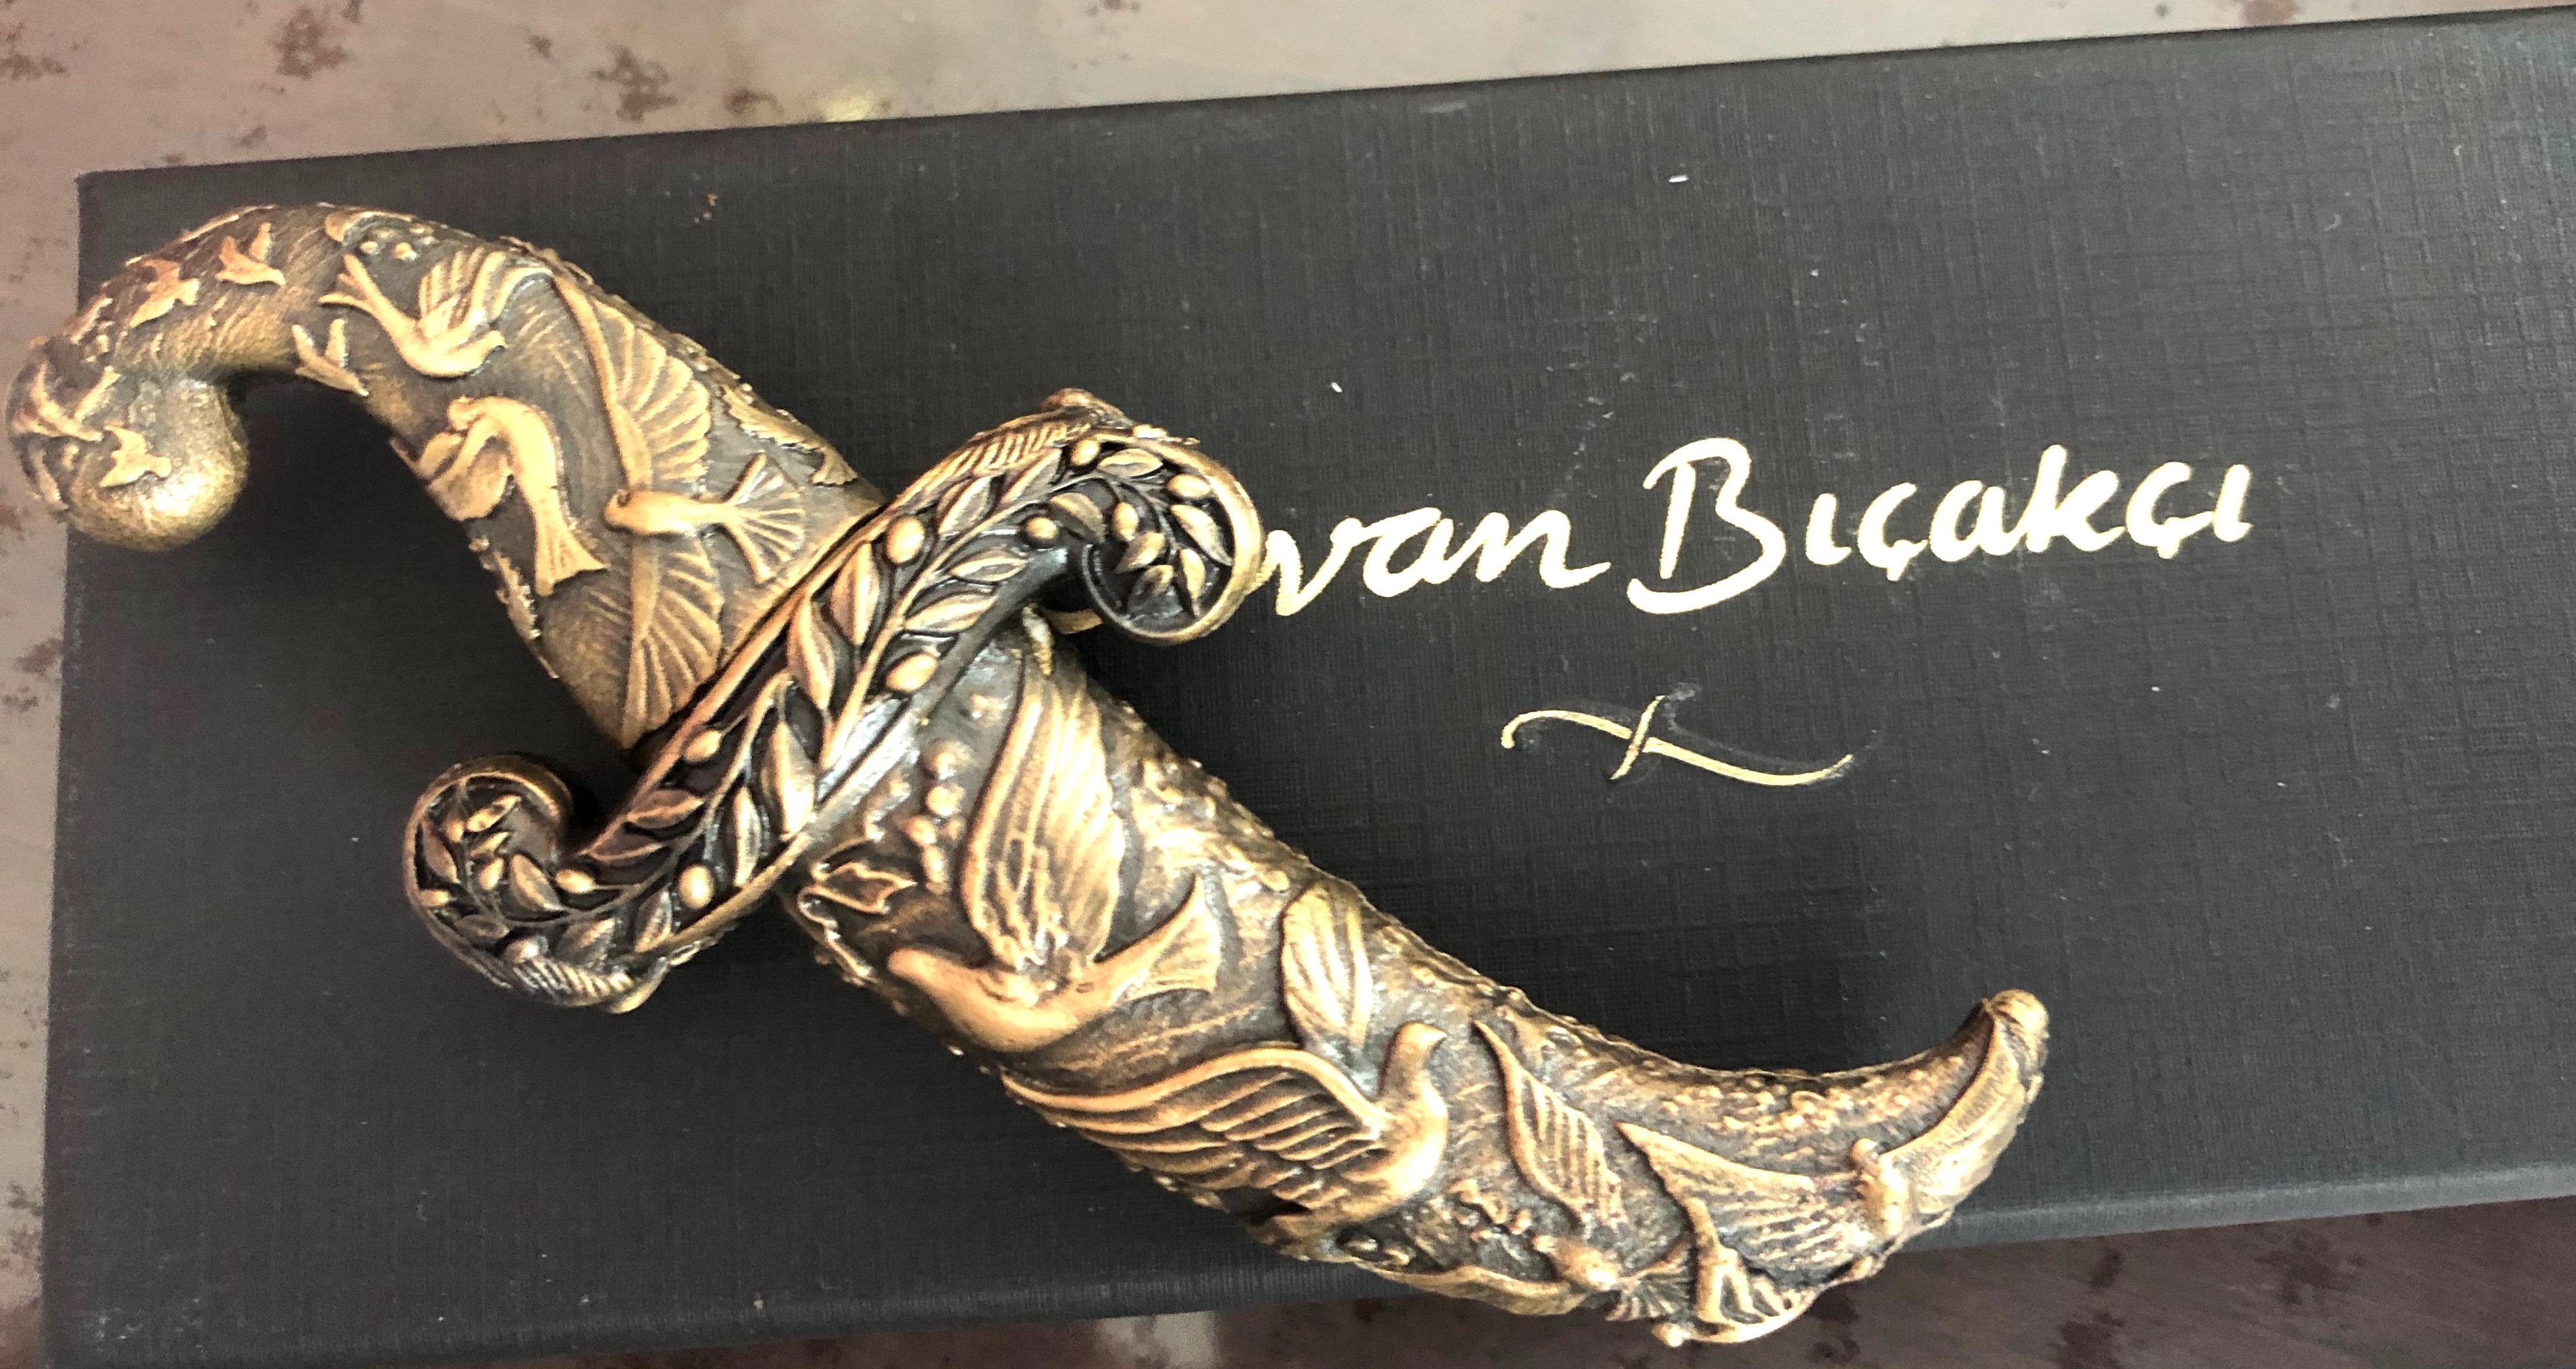 Sevan Bicakci at Watches & Wonders Miami